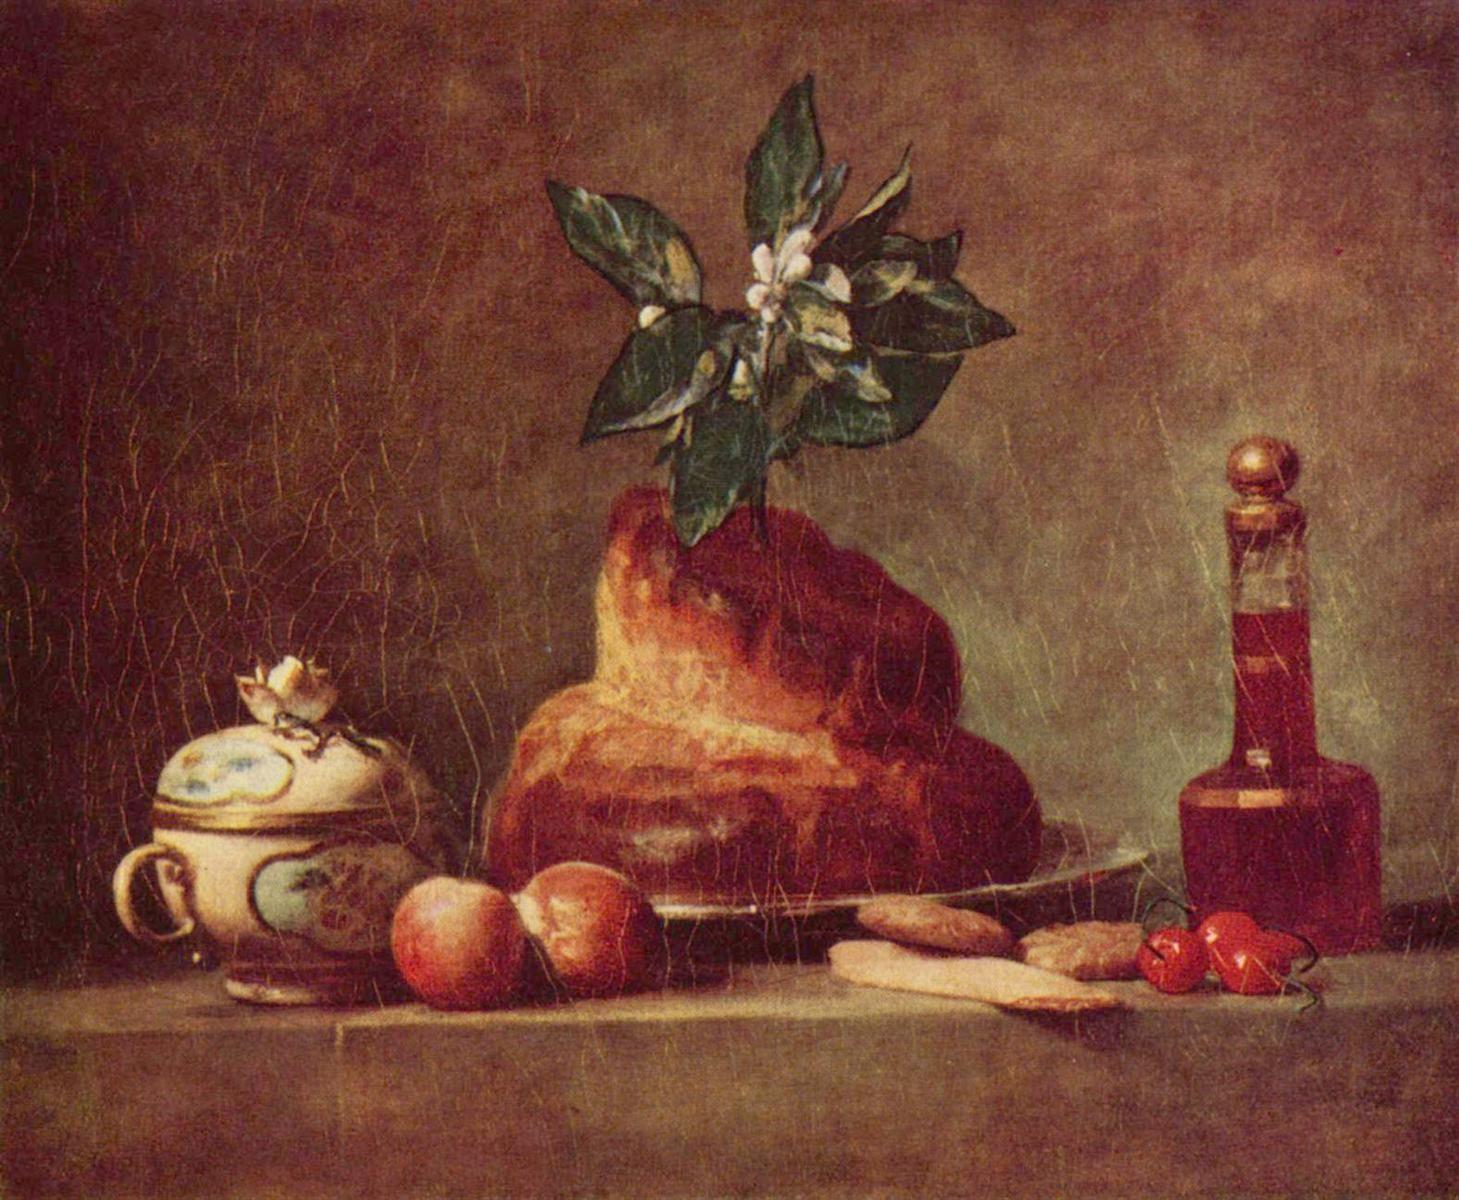 .:. Still life with Brioche, 1763 Jean-Baptiste-Simeon Chardin